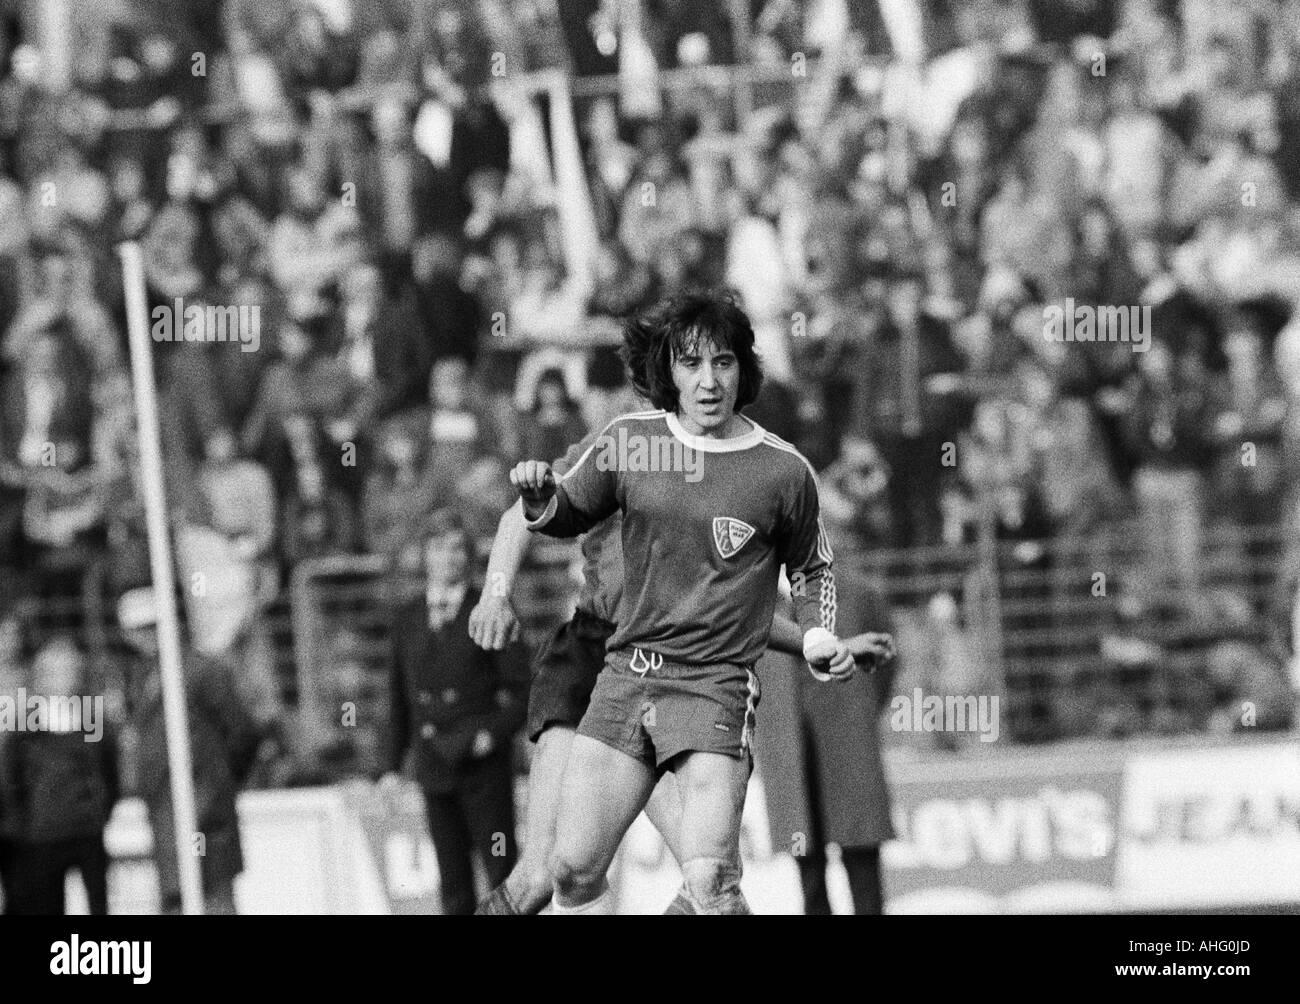 football, Bundesliga, 1973/1974, VfL Bochum versus Hamburger SV 2:0, Stadium at the Castroper Strasse in Bochum, scene of the match, Reinhard Majgl (Bochum) - Stock Image